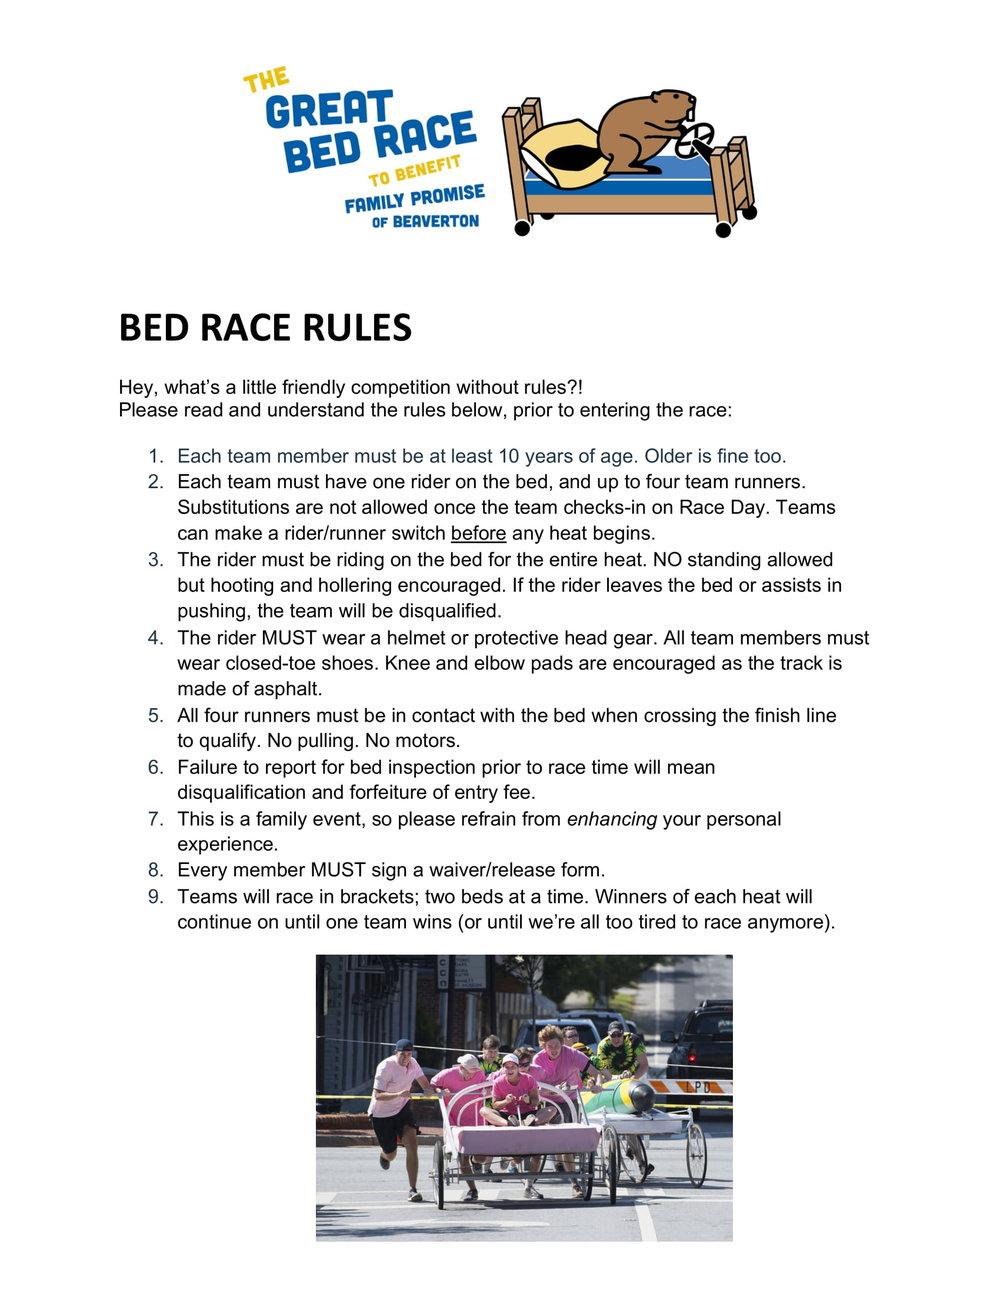 GBR rules & construction-2.jpg